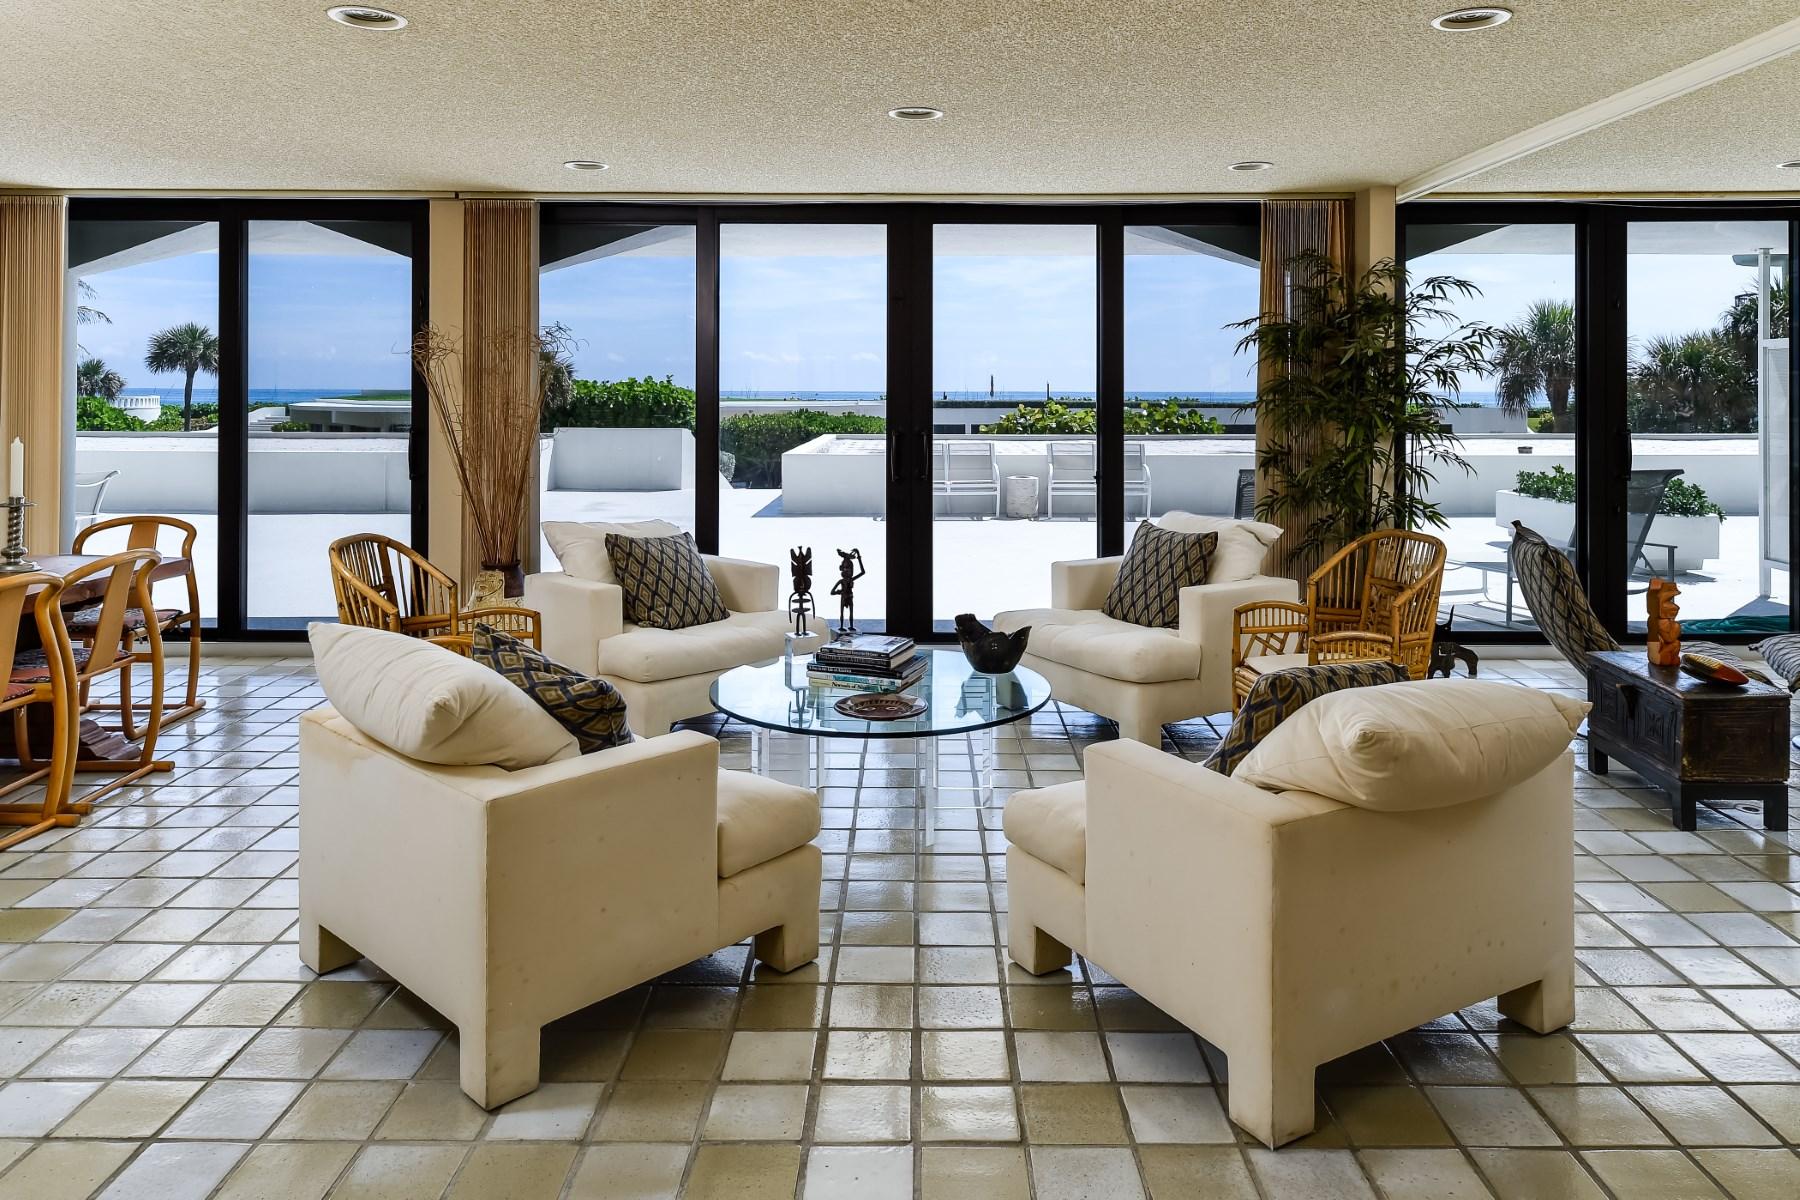 Condominium for Sale at Beautiful Ocean Views 2660 S Ocean Blvd Apt 102w Palm Beach, Florida 33480 United States